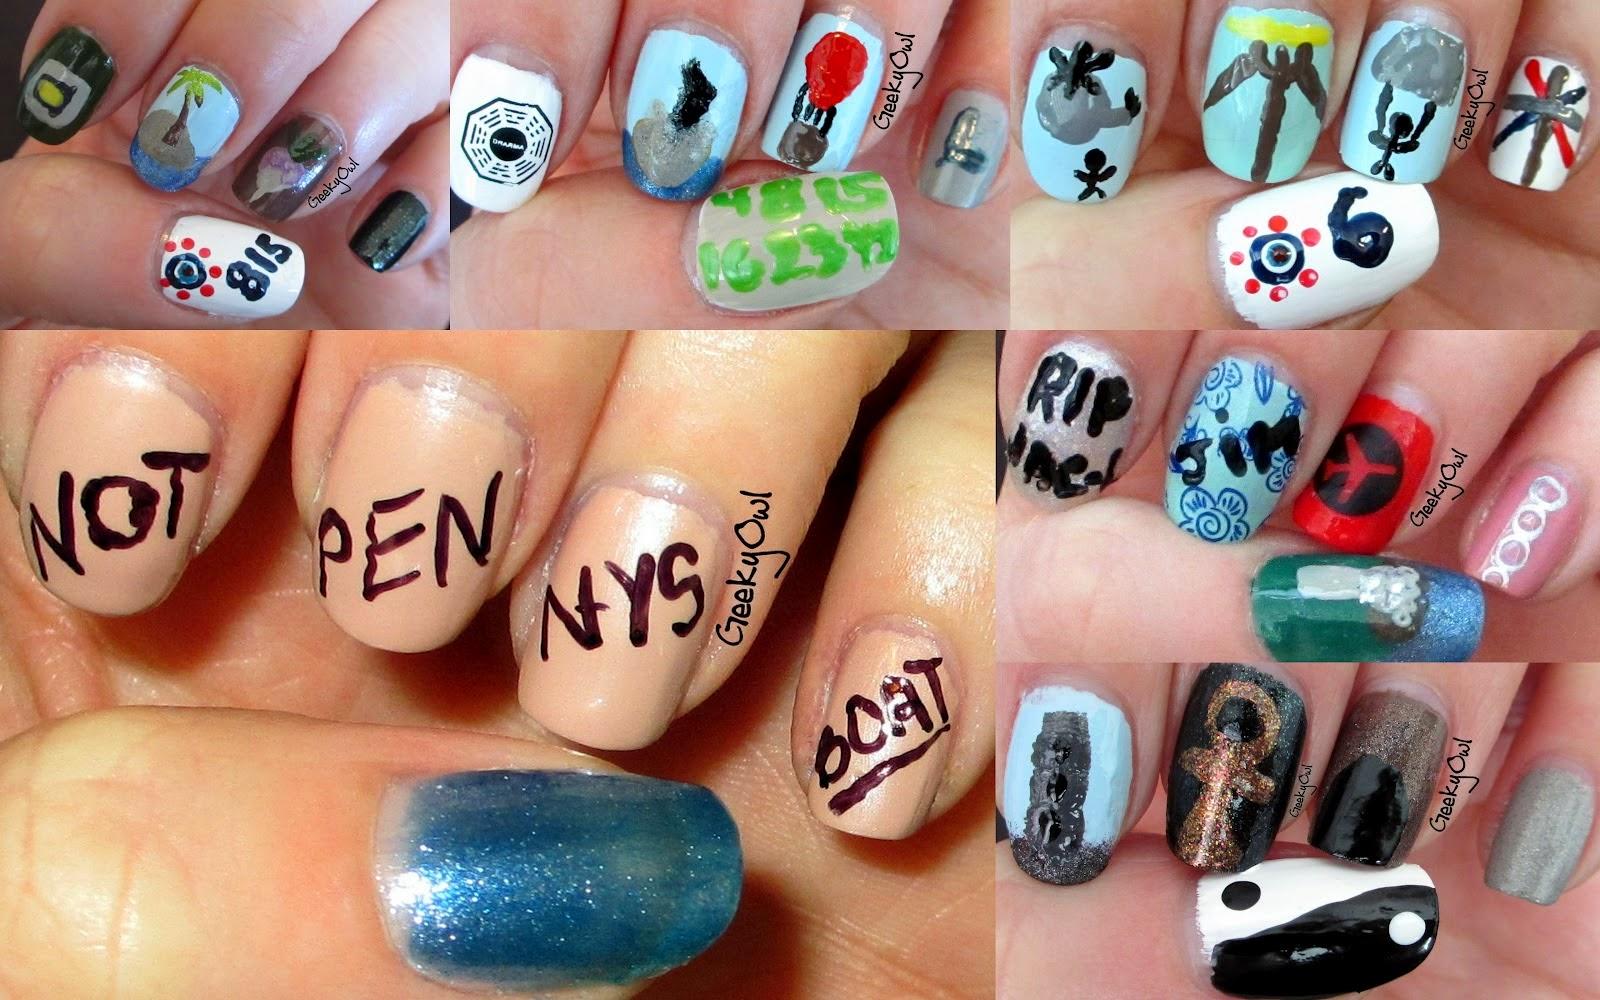 http://geekyowl.blogspot.com/2012/04/lostathon-round-up.html